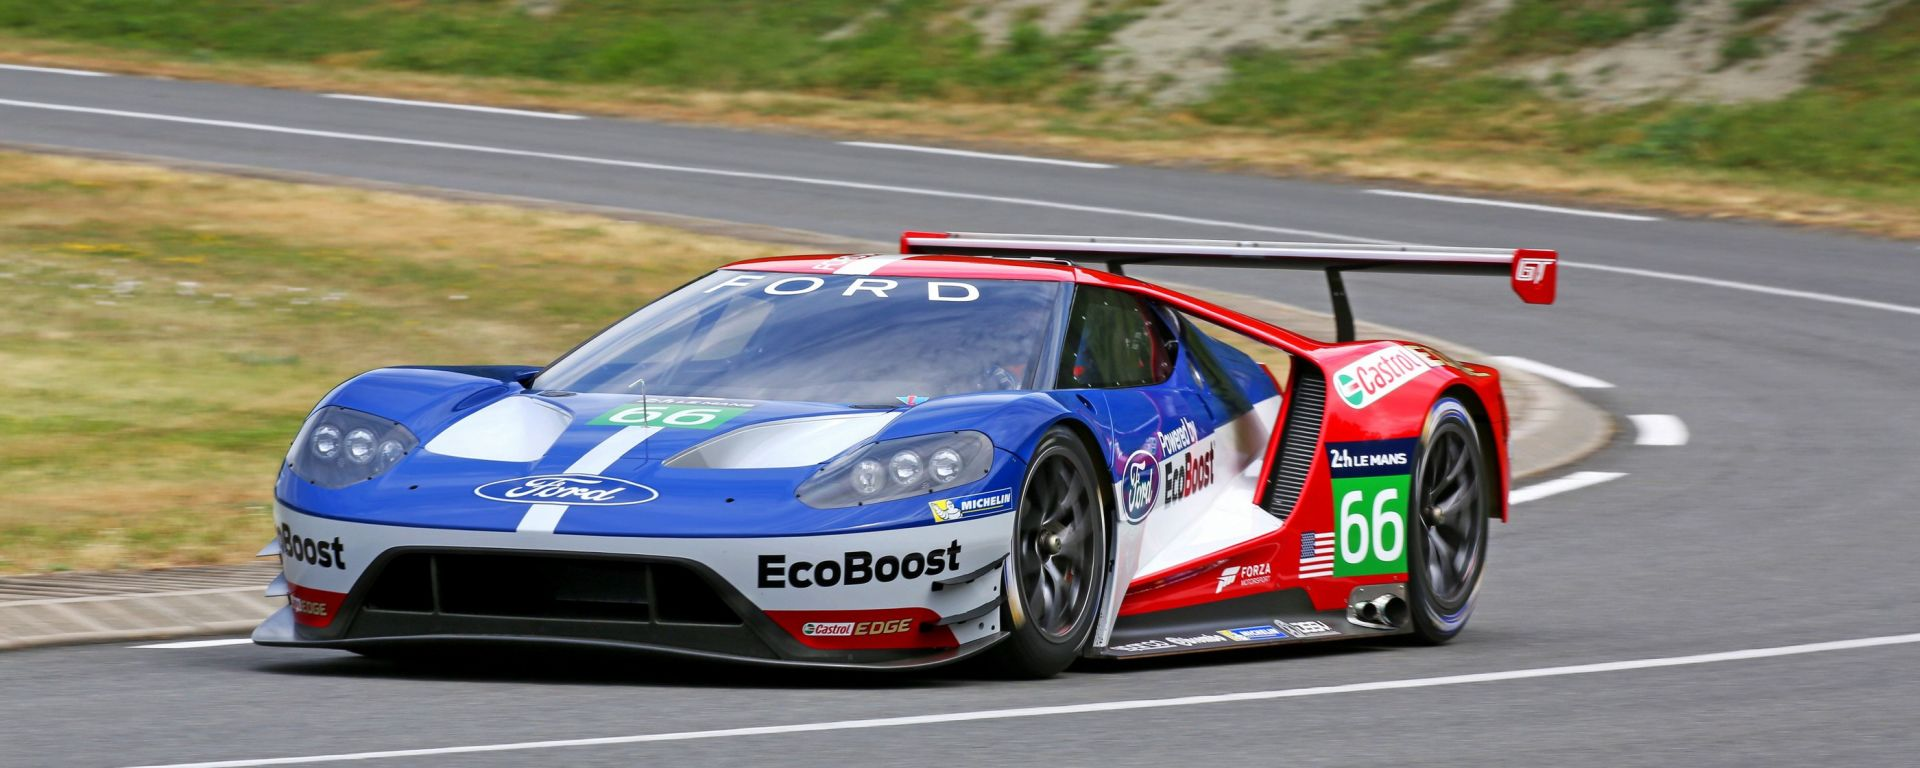 Ford GT racecar, arrivederci a Le Mans